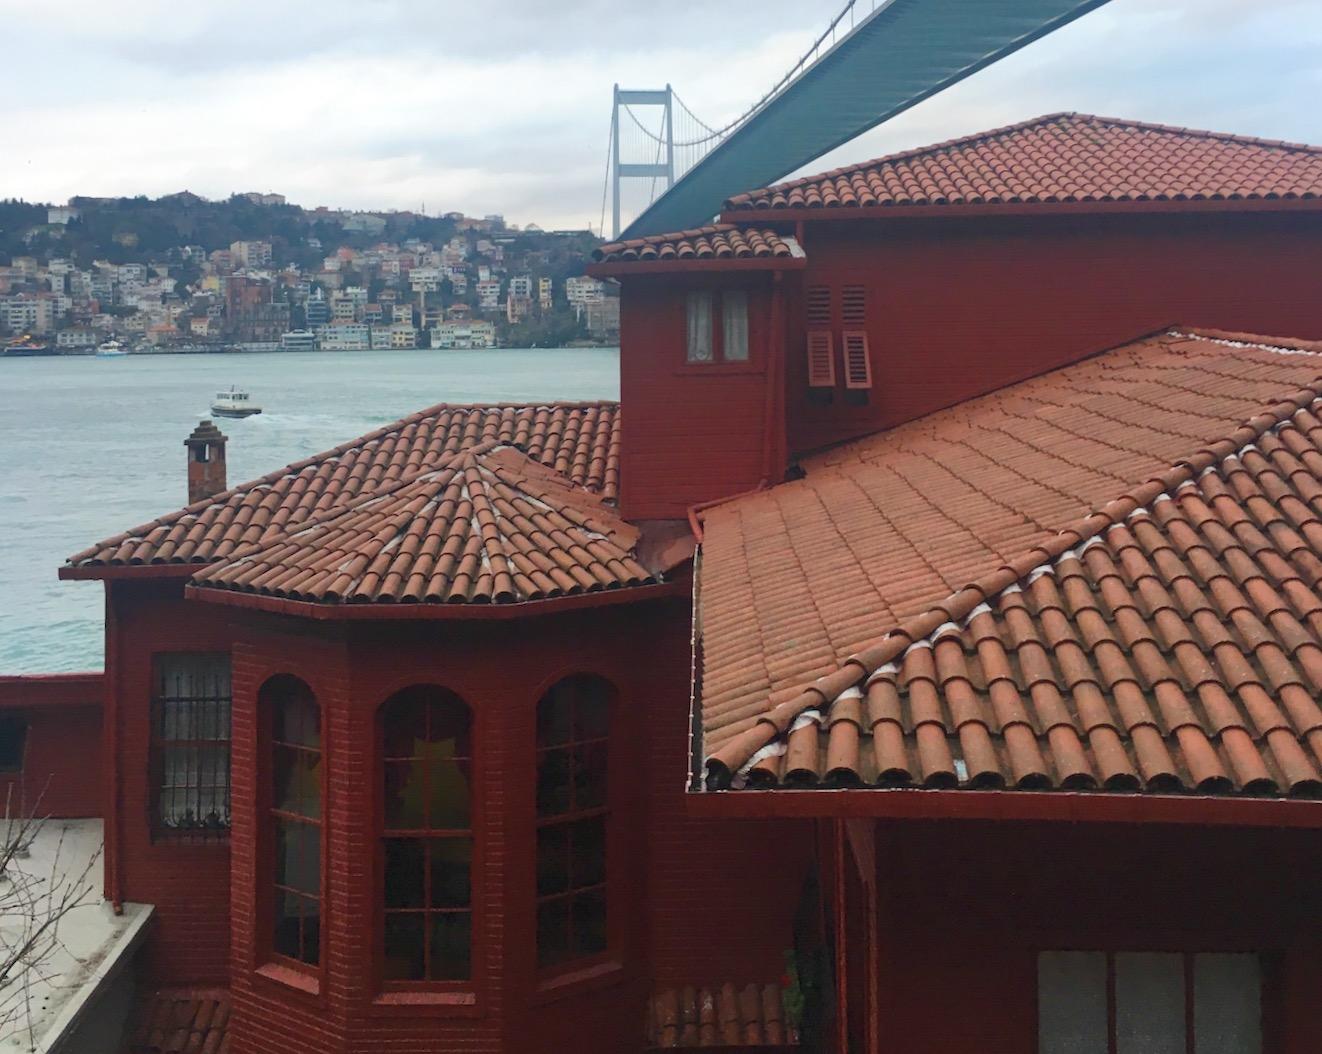 Baroque on the Bosphorus (Cornucopia Magazine Arts Diary)   Launched in 2009, the Yalı Concert series brings classical musicians into the intimate salon of Hekimbaşı Salih Efendi Yalı, the oxblood-red Ottoman summer house under Istanbul's second bridge.